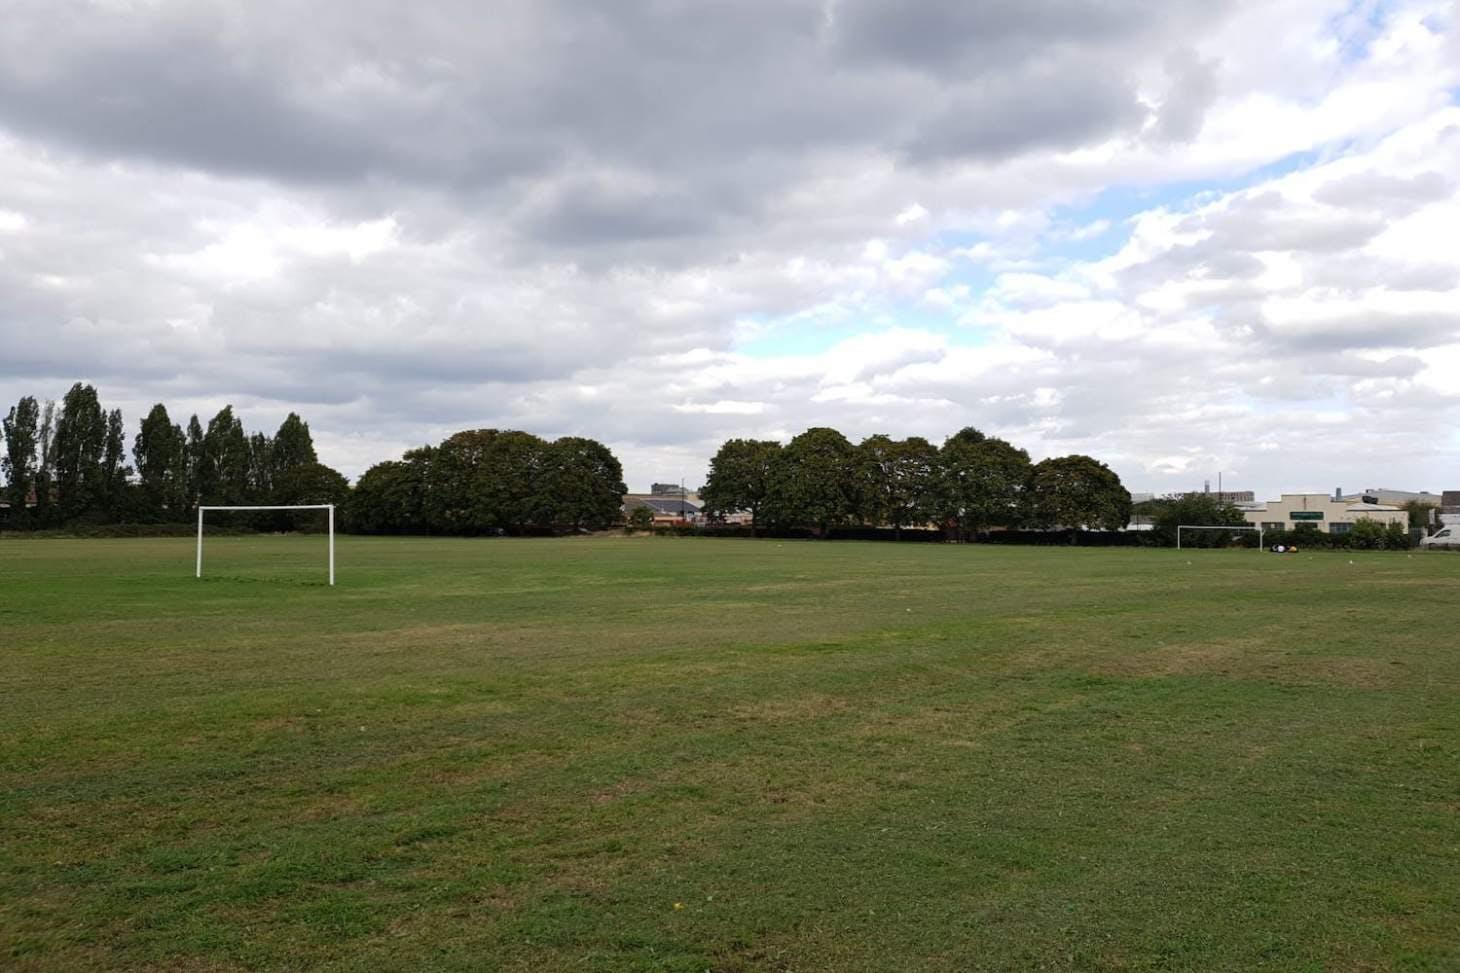 Bull Lane Playing Field 11 a side | Grass football pitch